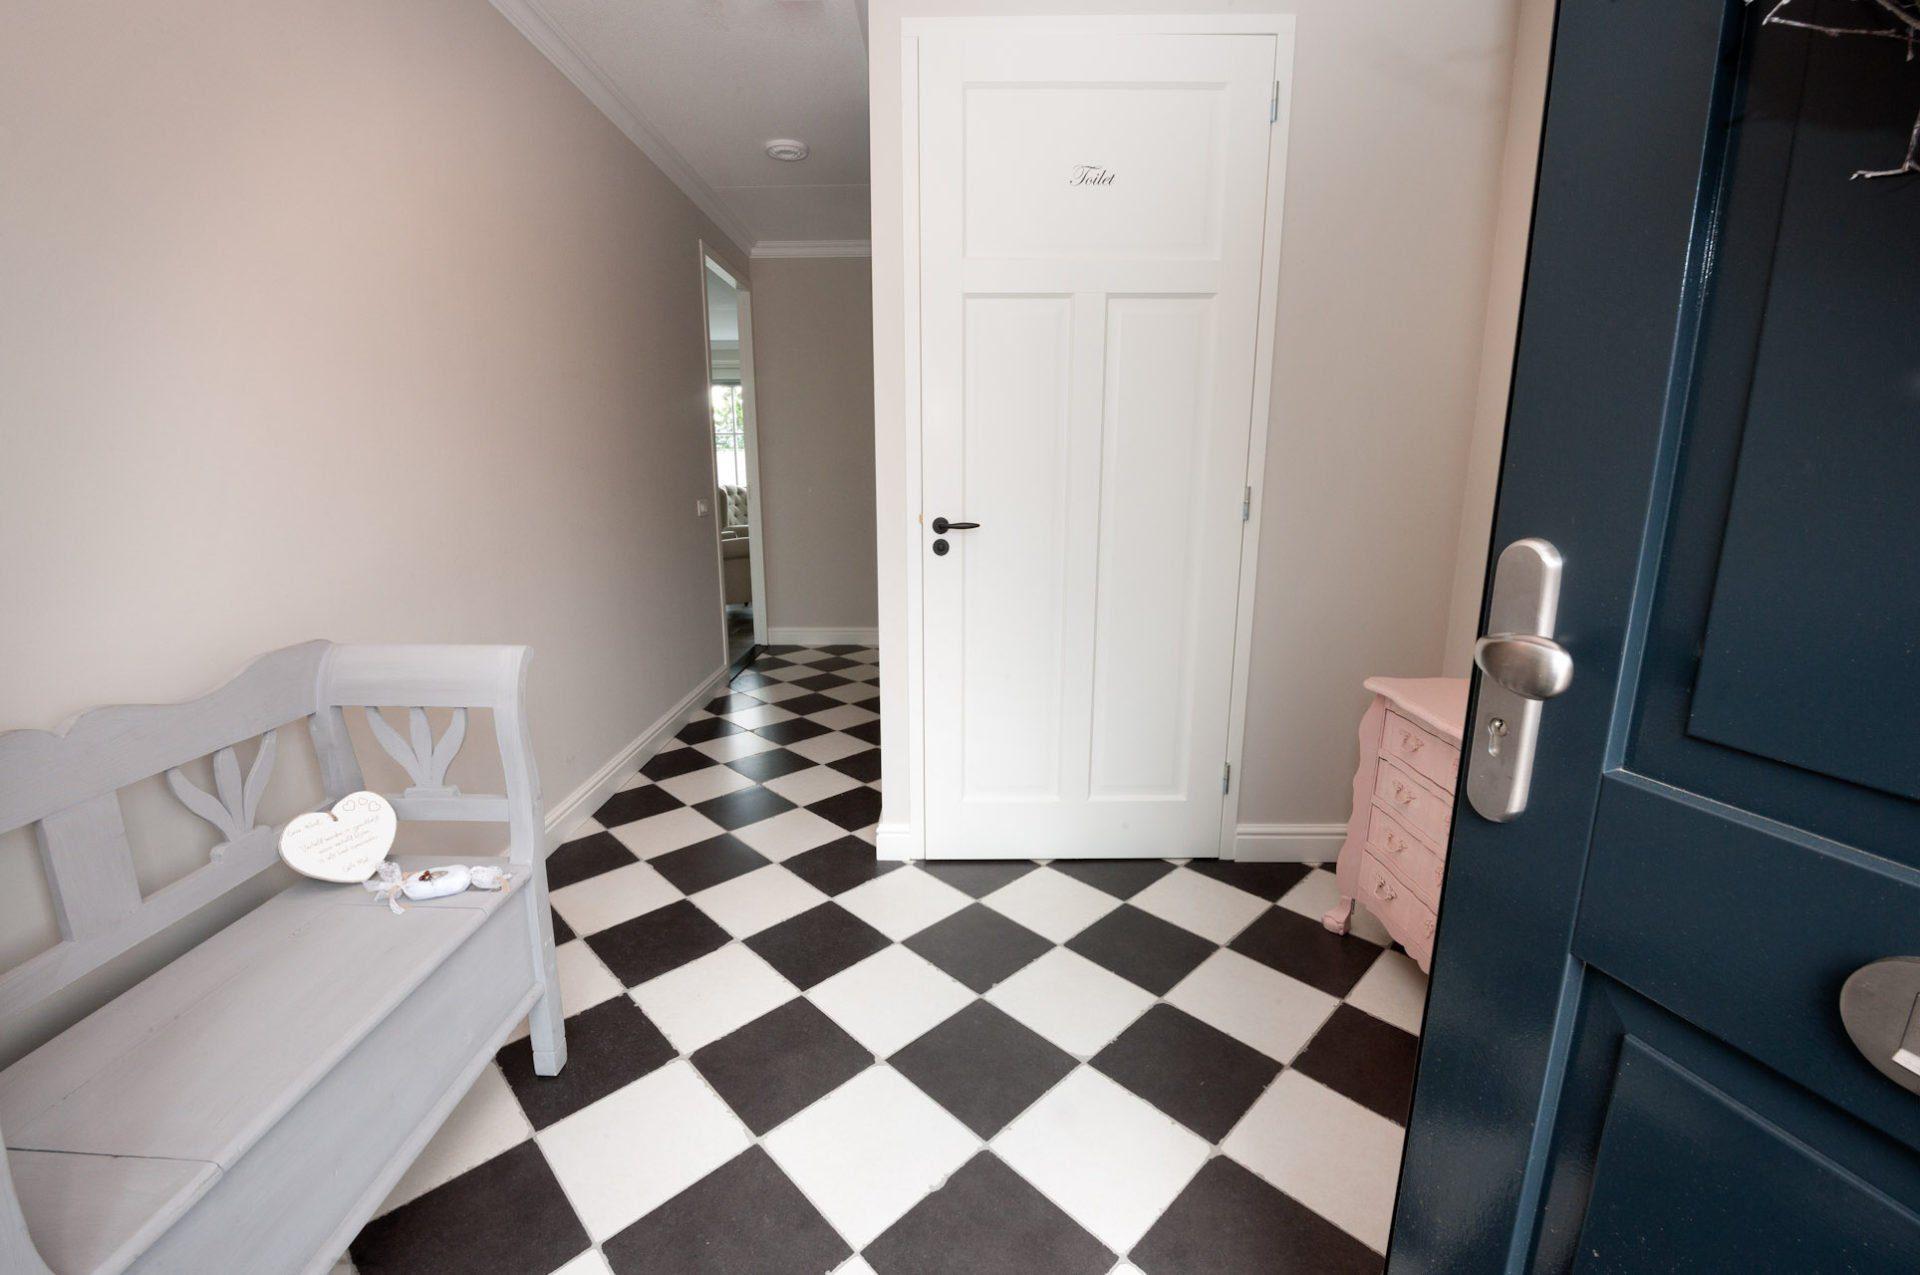 Zwart Witte Tegels : Houtlook tegels in woonkamer zwart wit geblokte vloer in hal